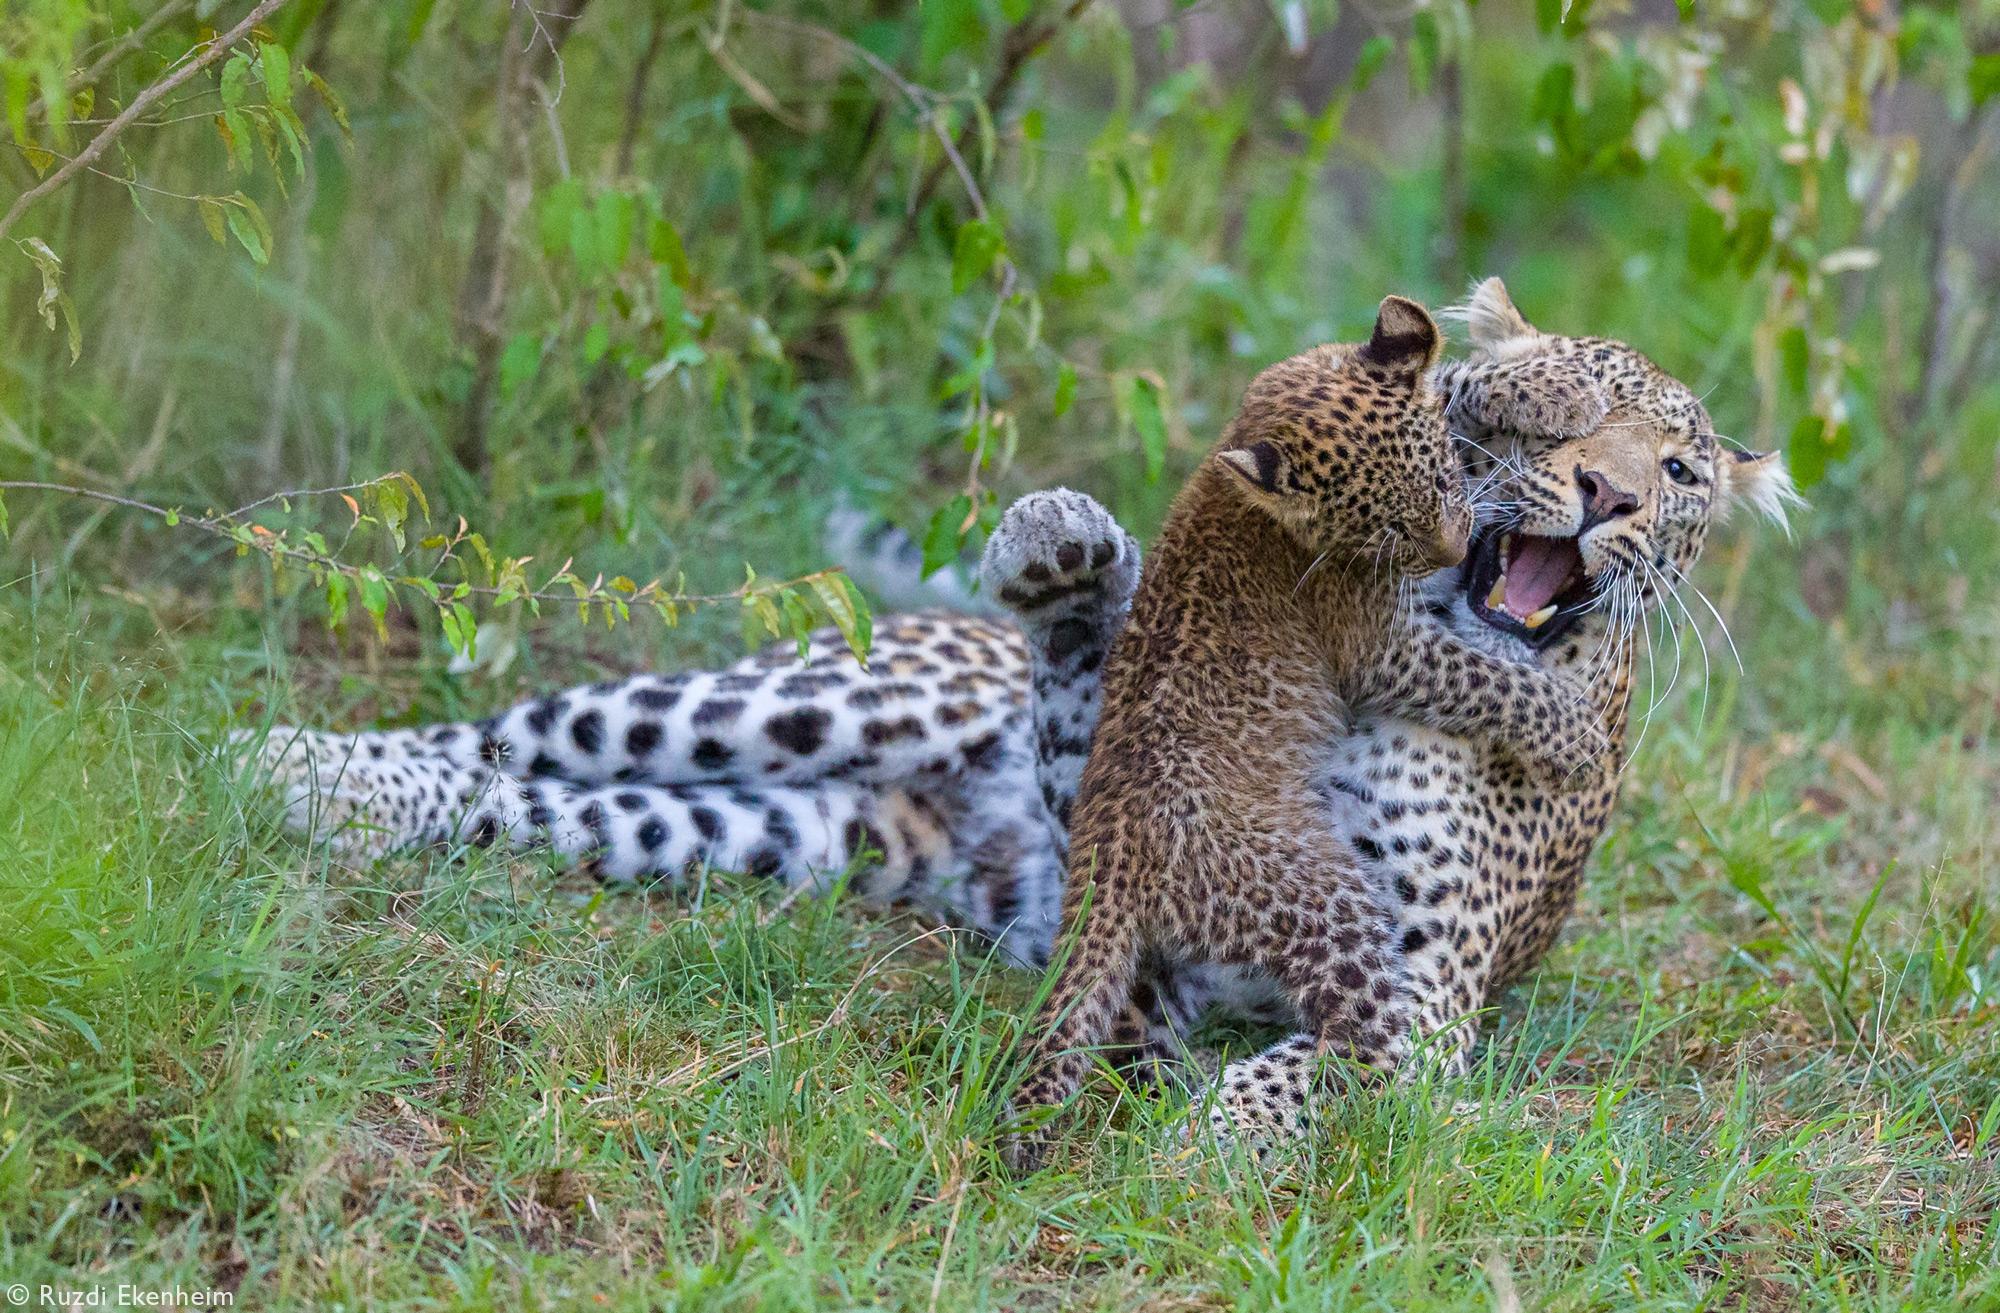 A leopardess and her cub play in Maasai Mara National Reserve, Kenya